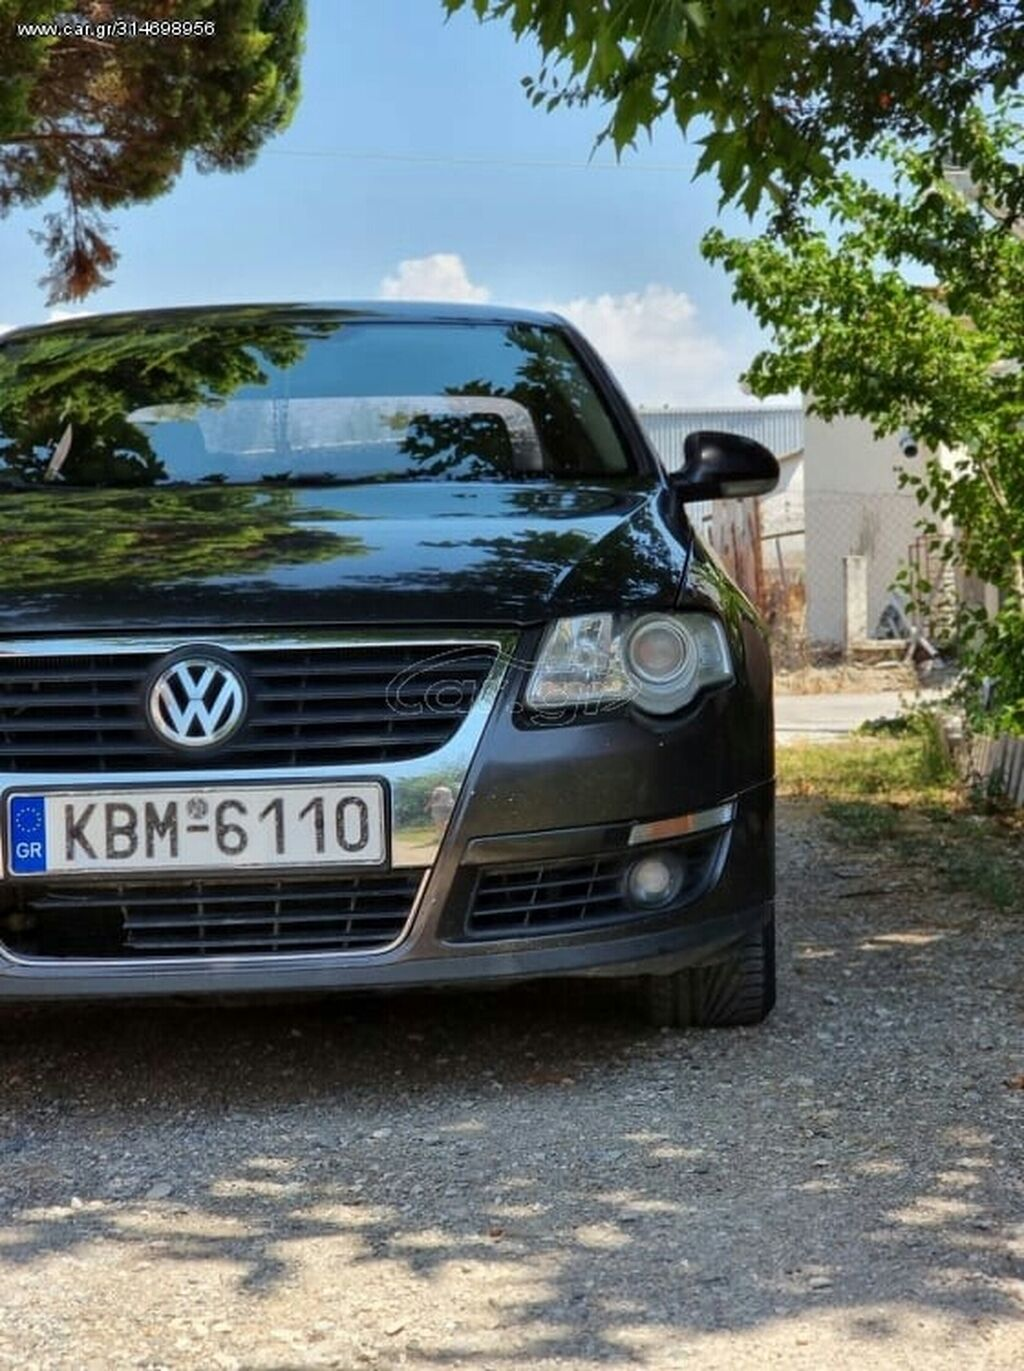 Volkswagen Passat 1.6 l. 2005 | 335000 km | η αγγελία δημοσιεύτηκε 25 Ιούλιος 2021 14:33:06: Volkswagen Passat 1.6 l. 2005 | 335000 km